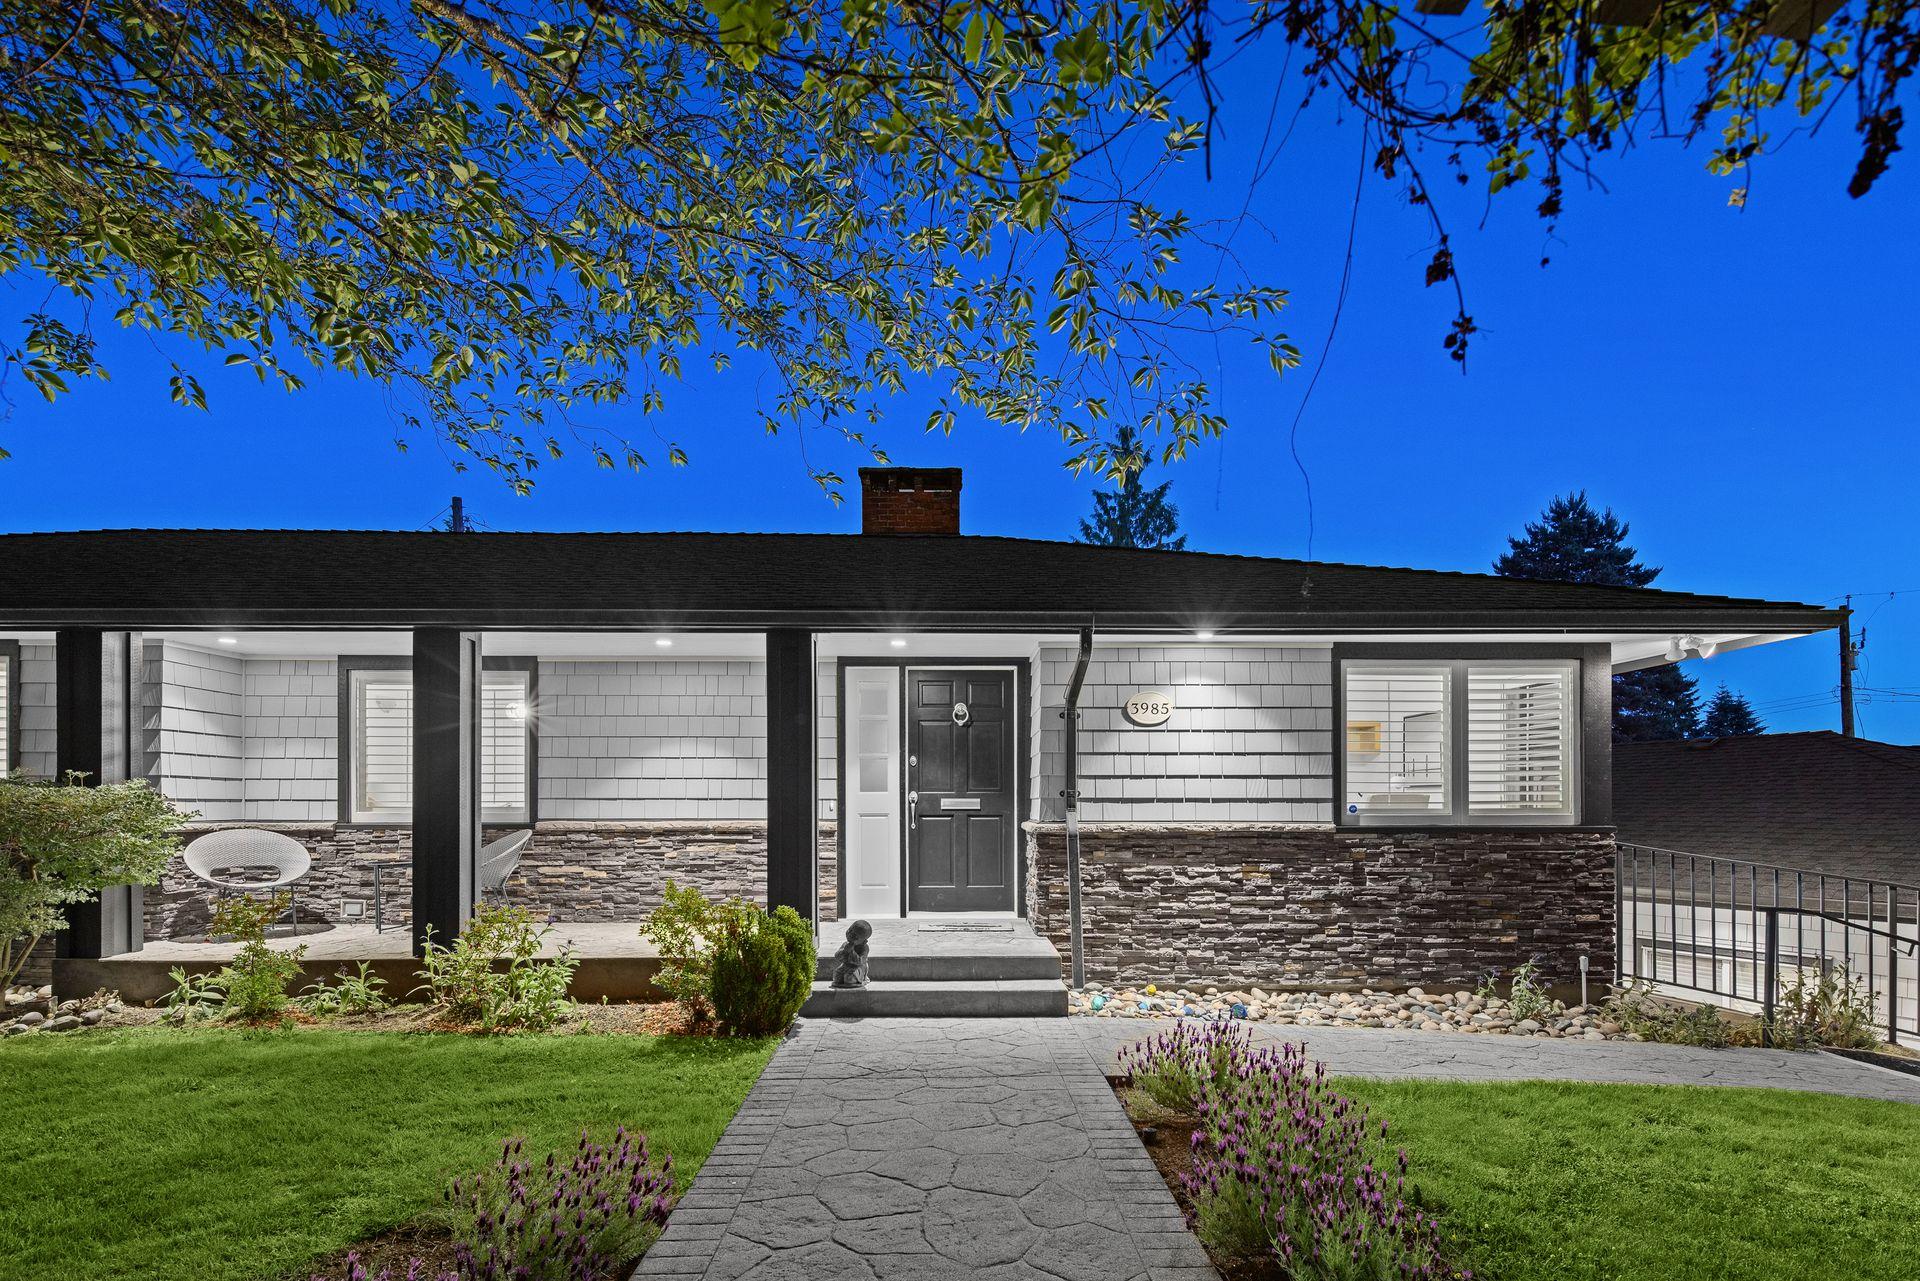 3985 Sunnycrest Drive, Forest Hills NV, North Vancouver